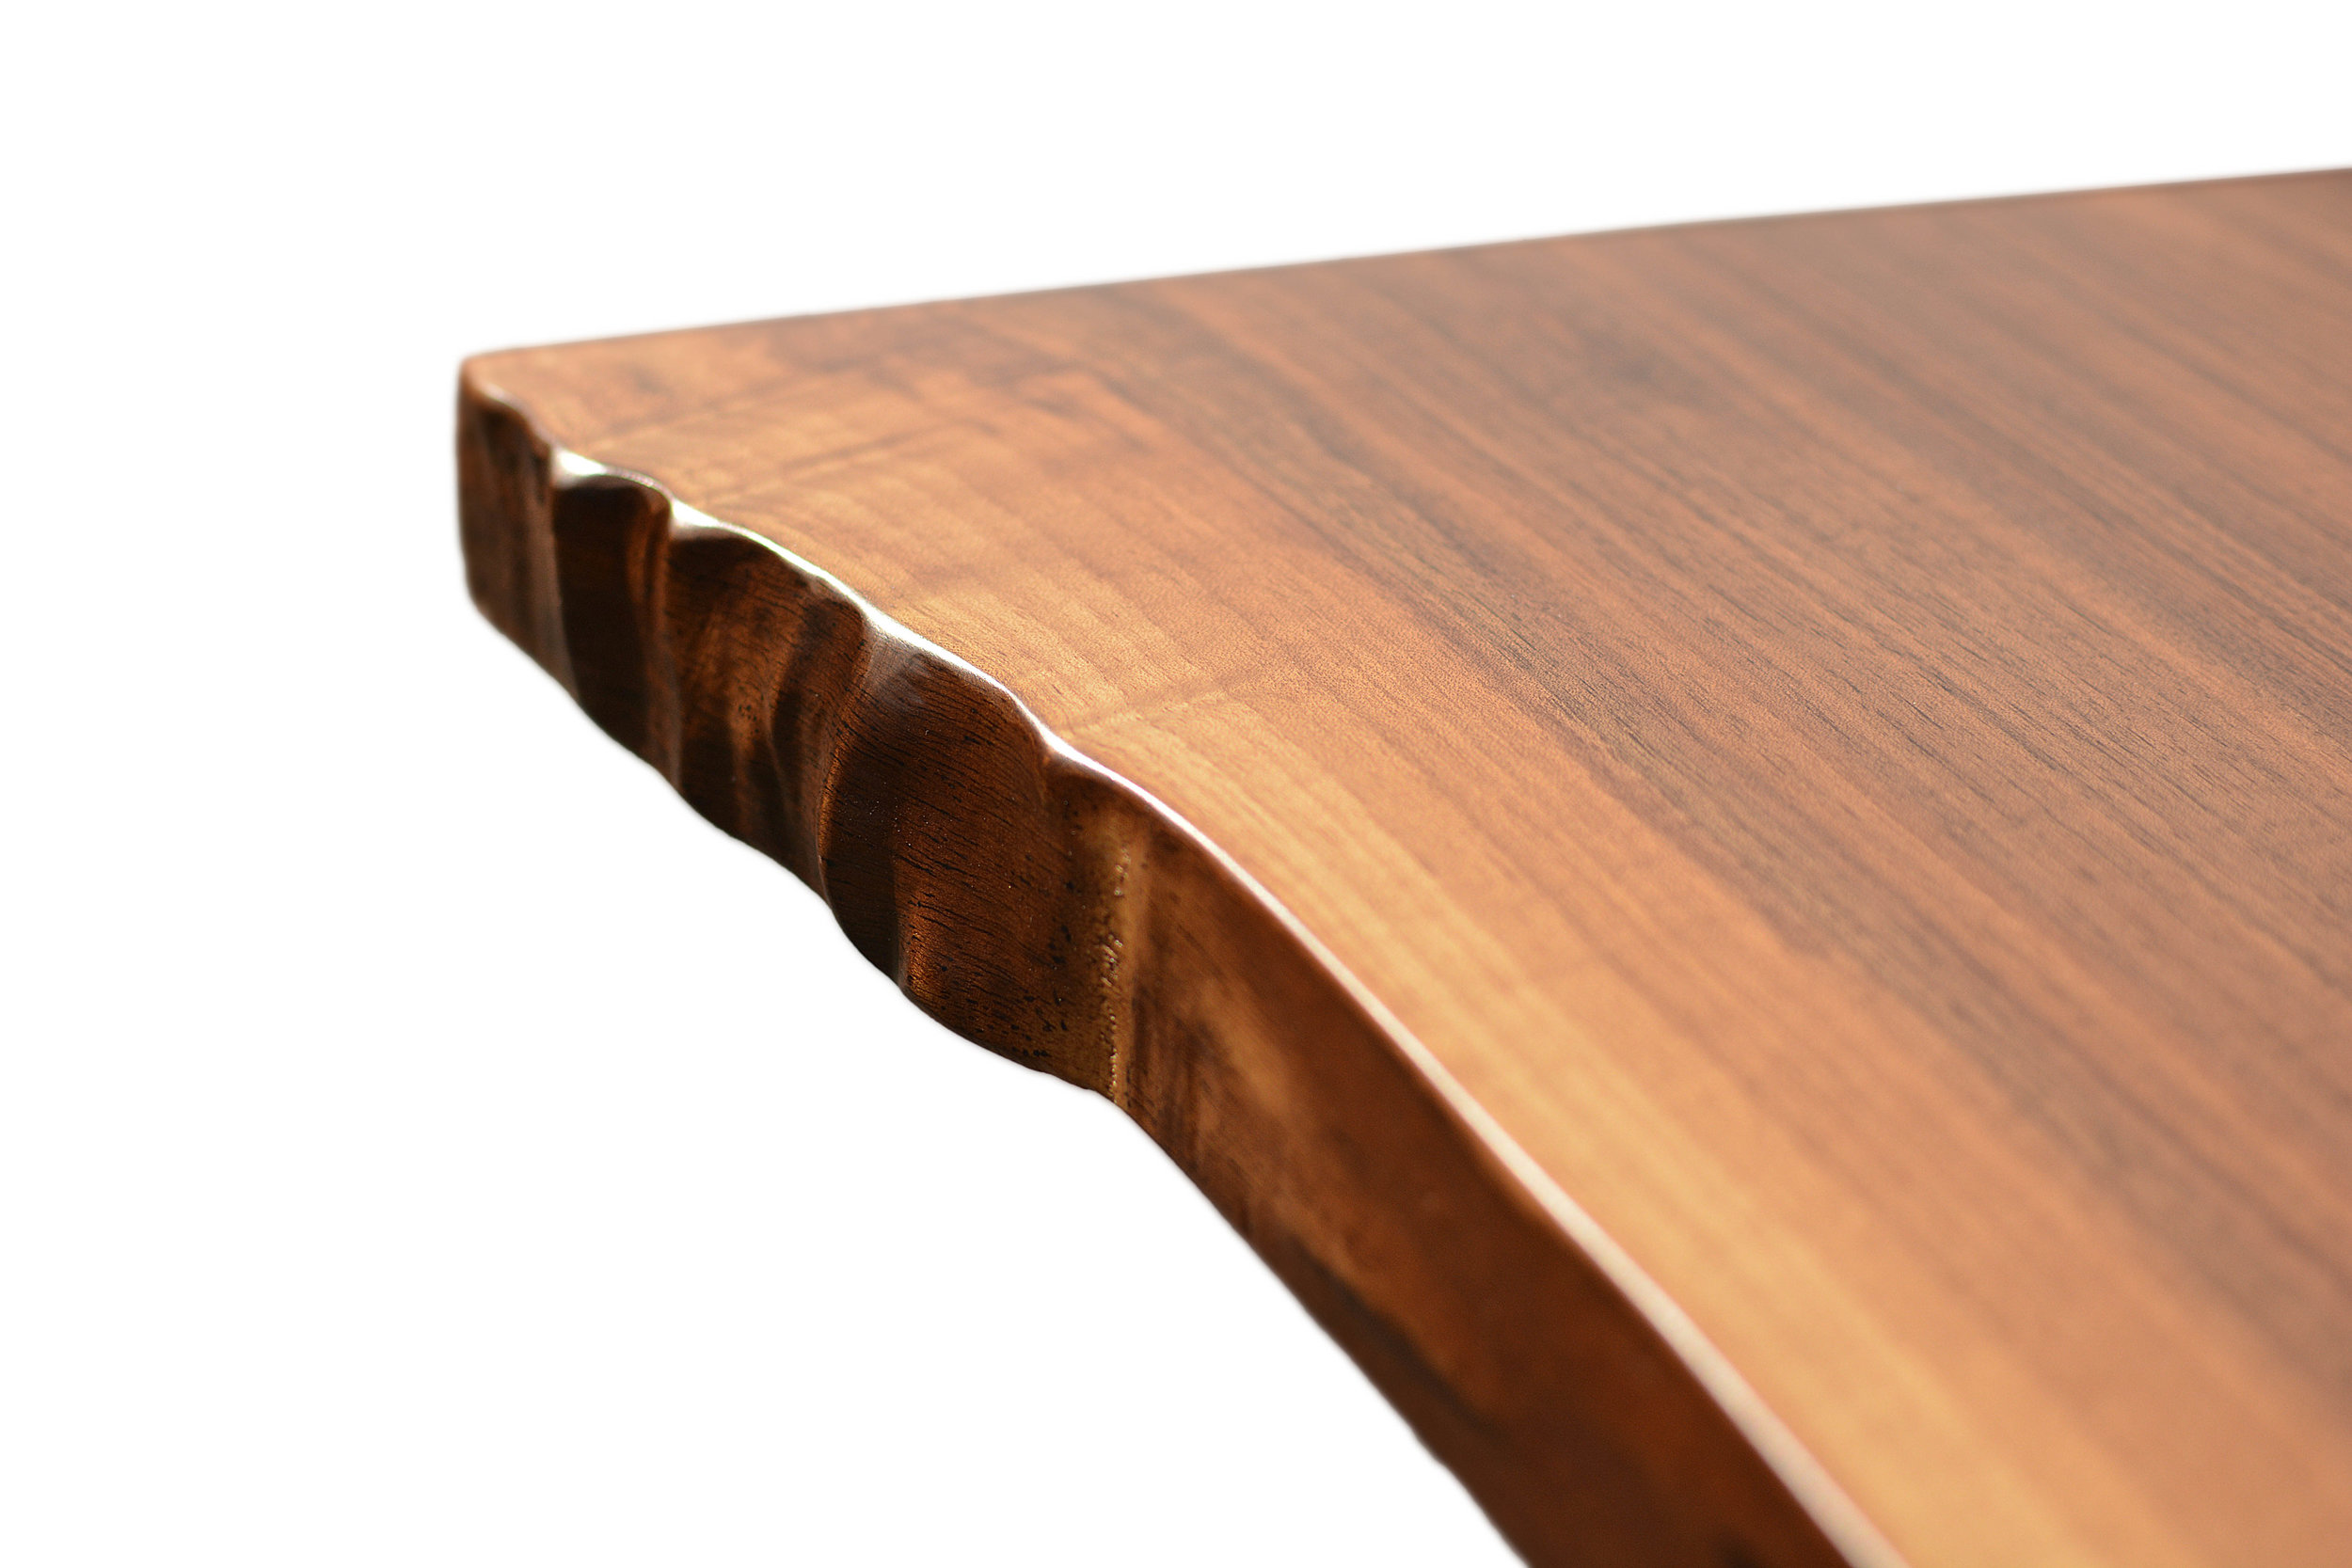 Etz & Steel Hermes Live Edge Walnut Table Close Up 1.JPG